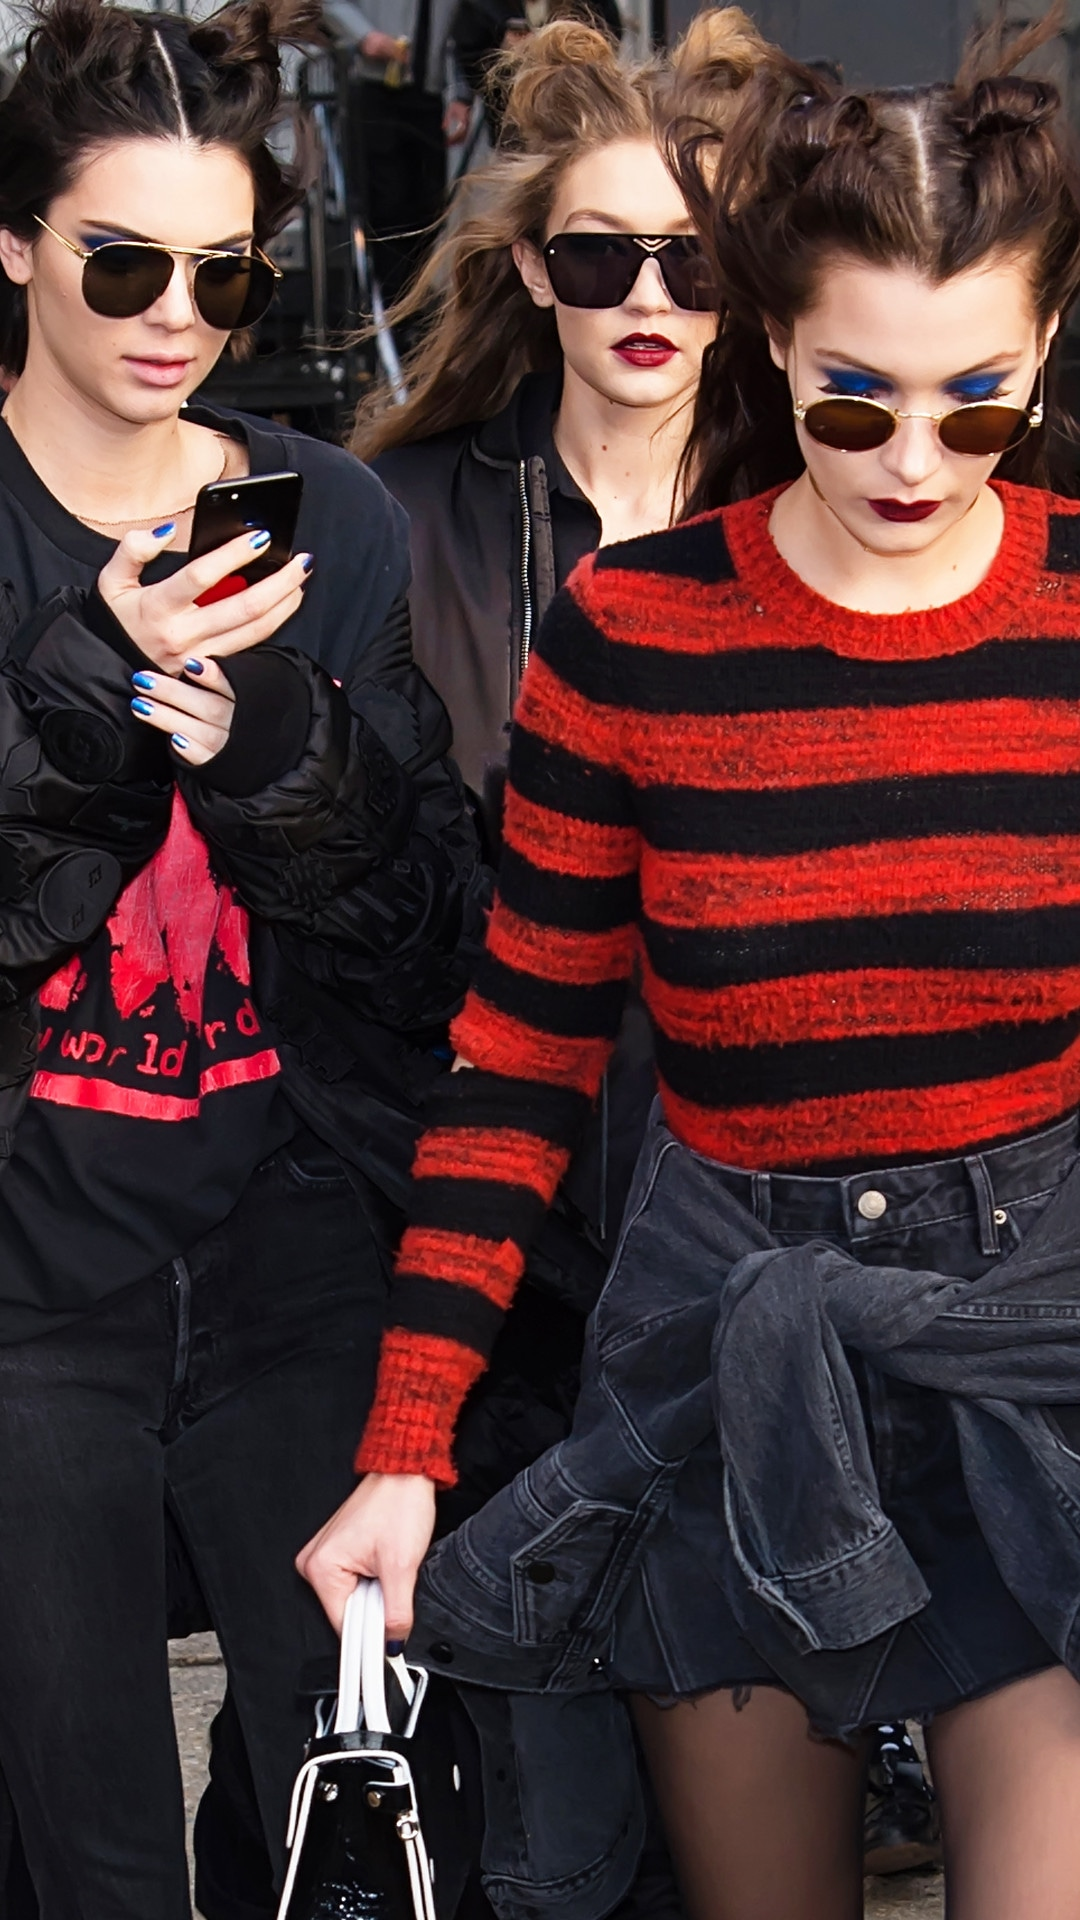 ESC: Kendall Jenner, Gigi Hadid, Bella Hadid